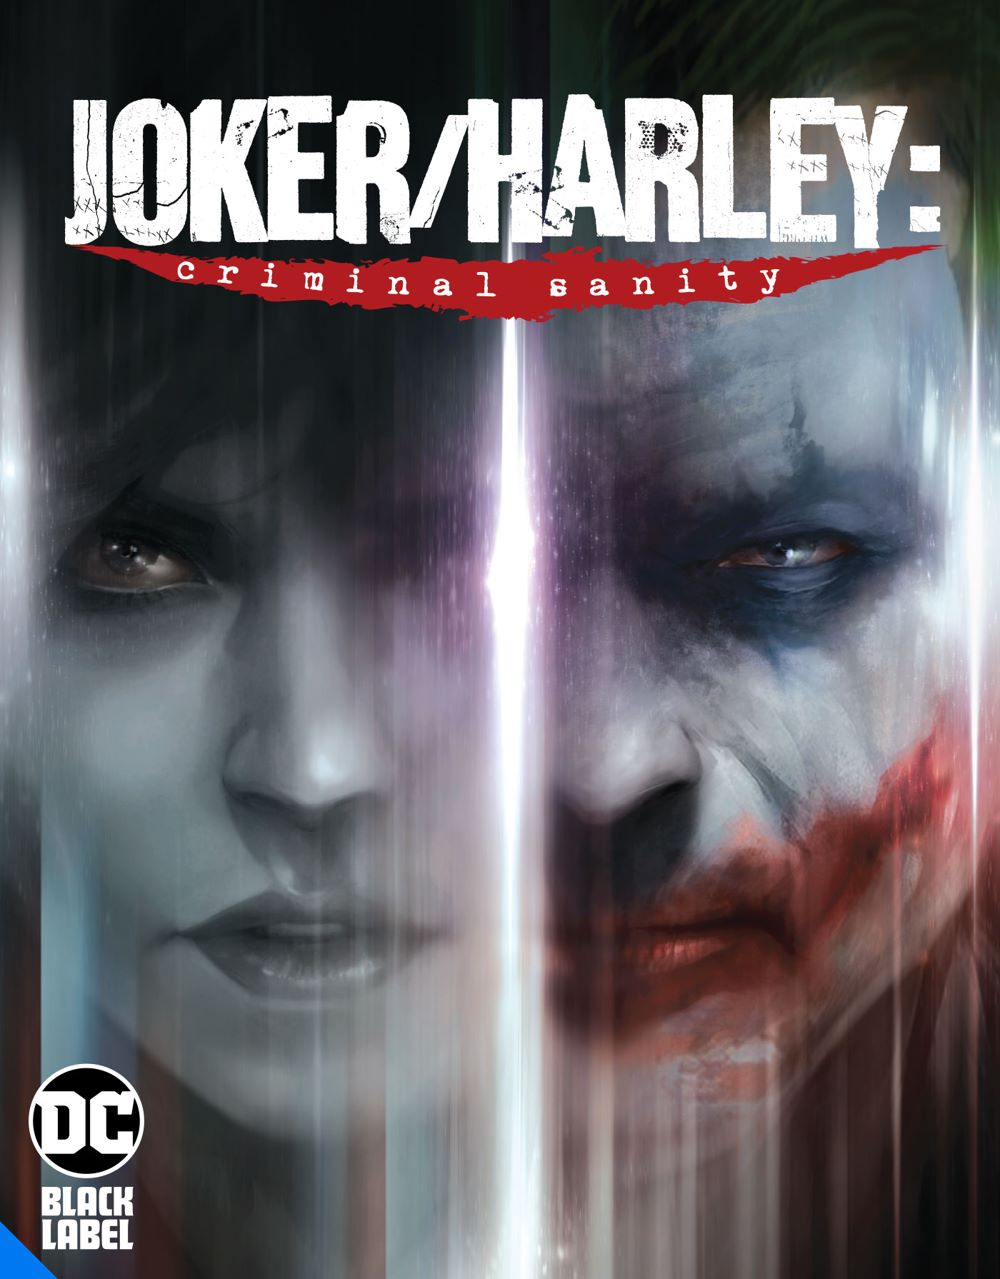 jokerharleycriminalinsanity_adv1 DC Comics July 2021 Solicitations